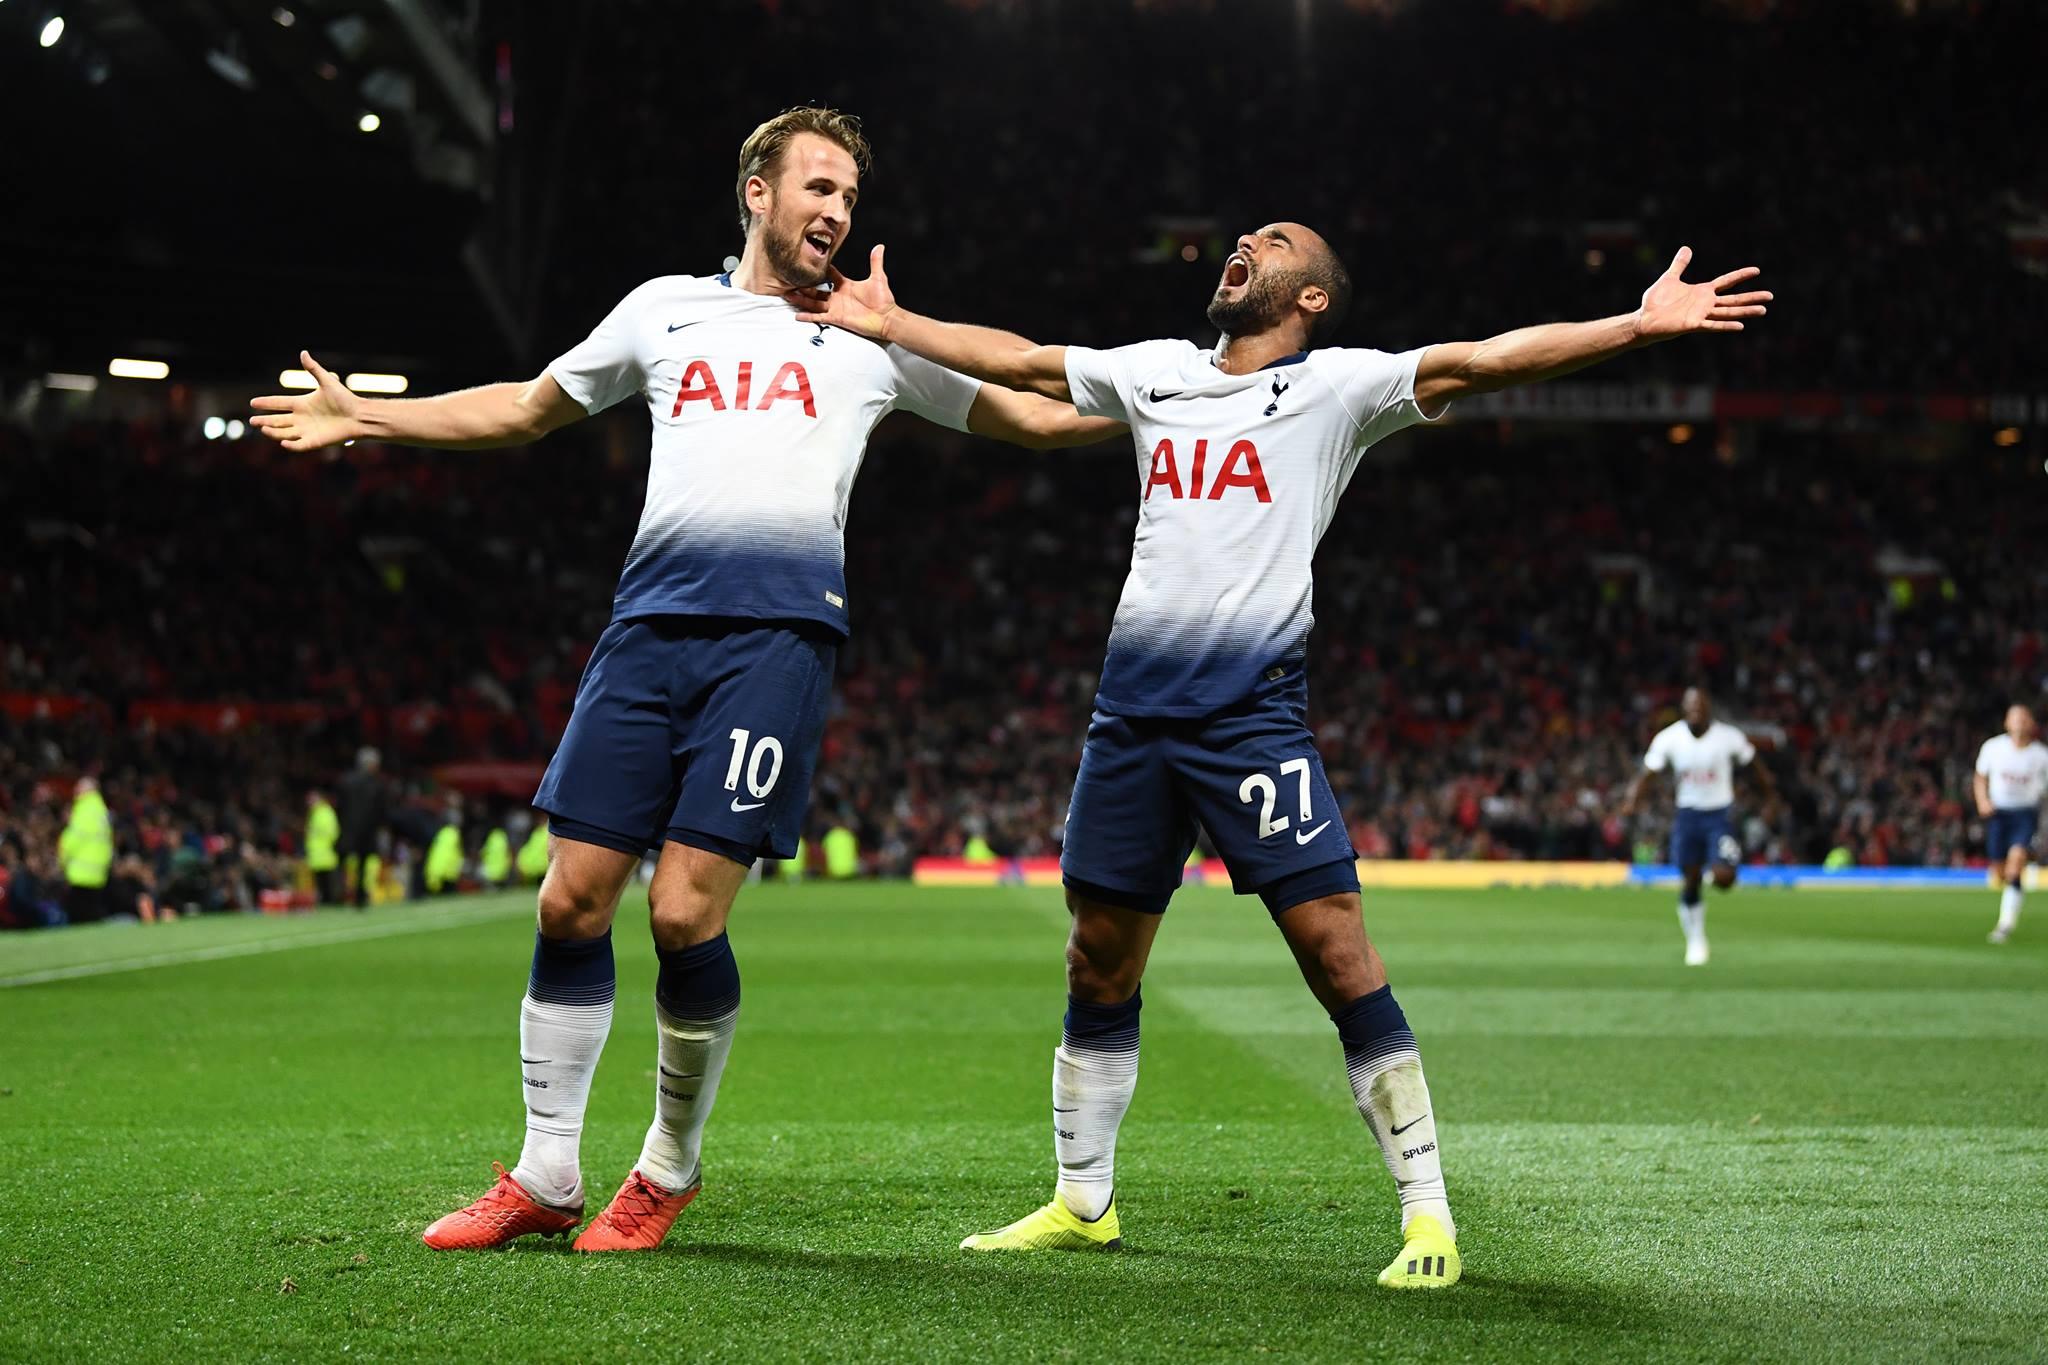 Tottenham Hotspurs Spurs Partners Sponsors Brand Associations Logos Advertising Investors AIA